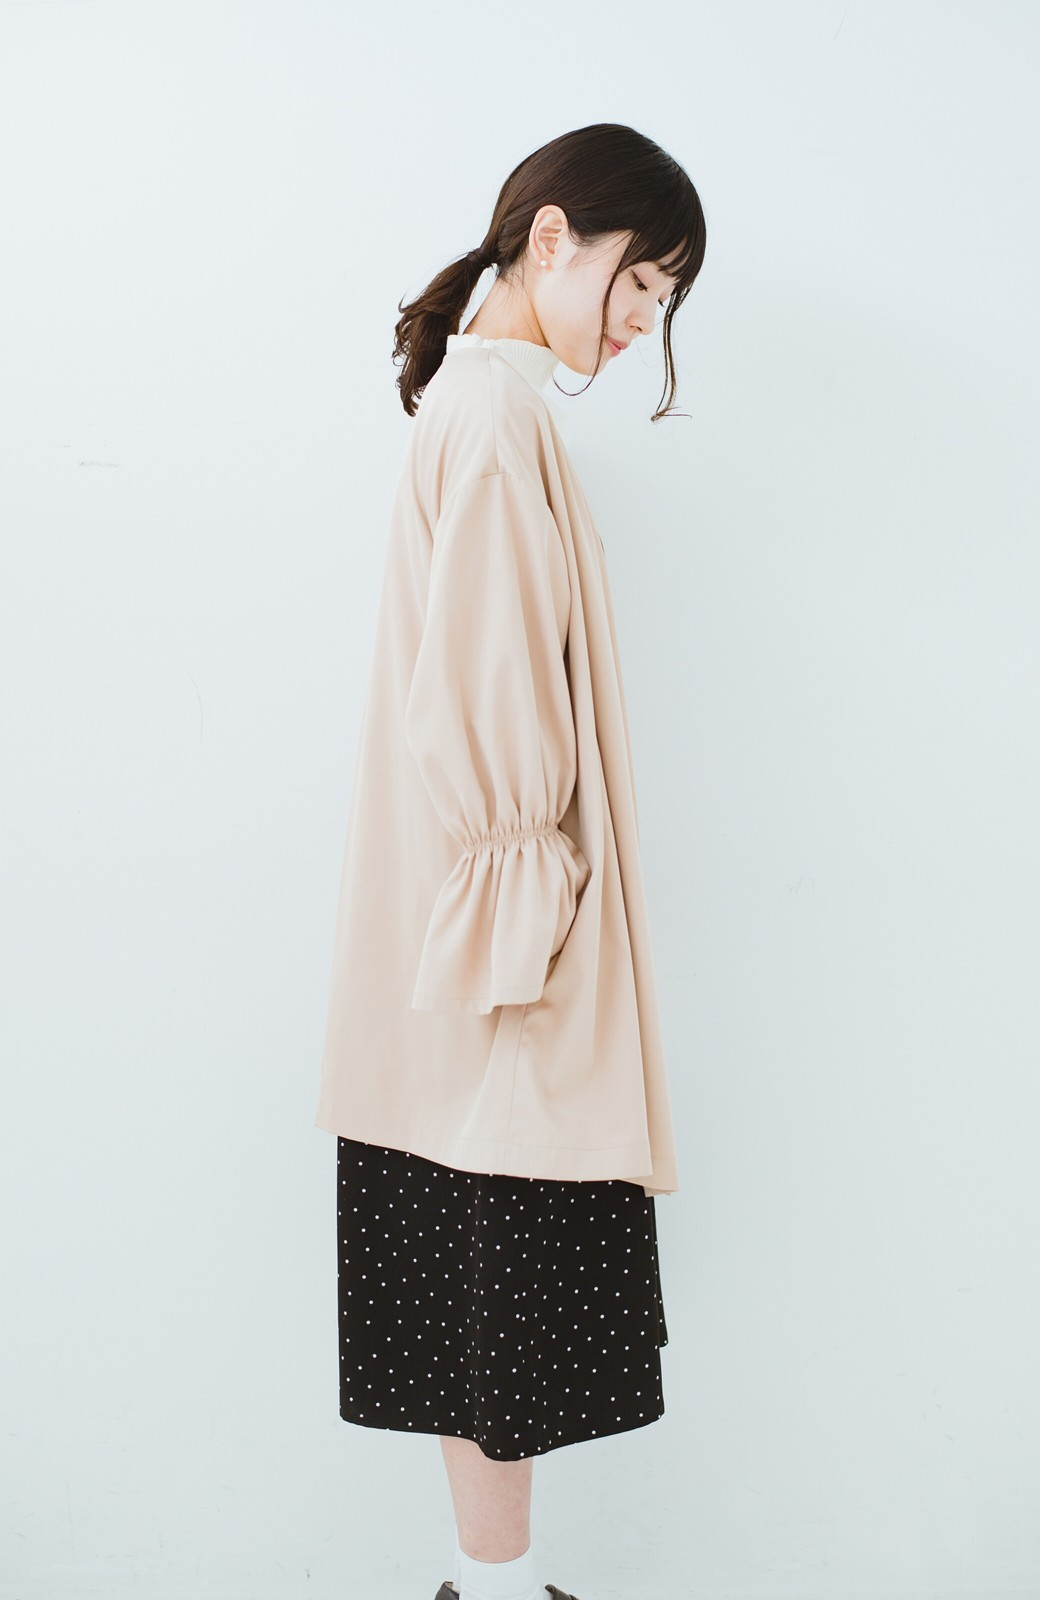 haco! ただ羽織るだけでオシャレに見える 気軽なフレアースリーブコート <ベージュ>の商品写真12